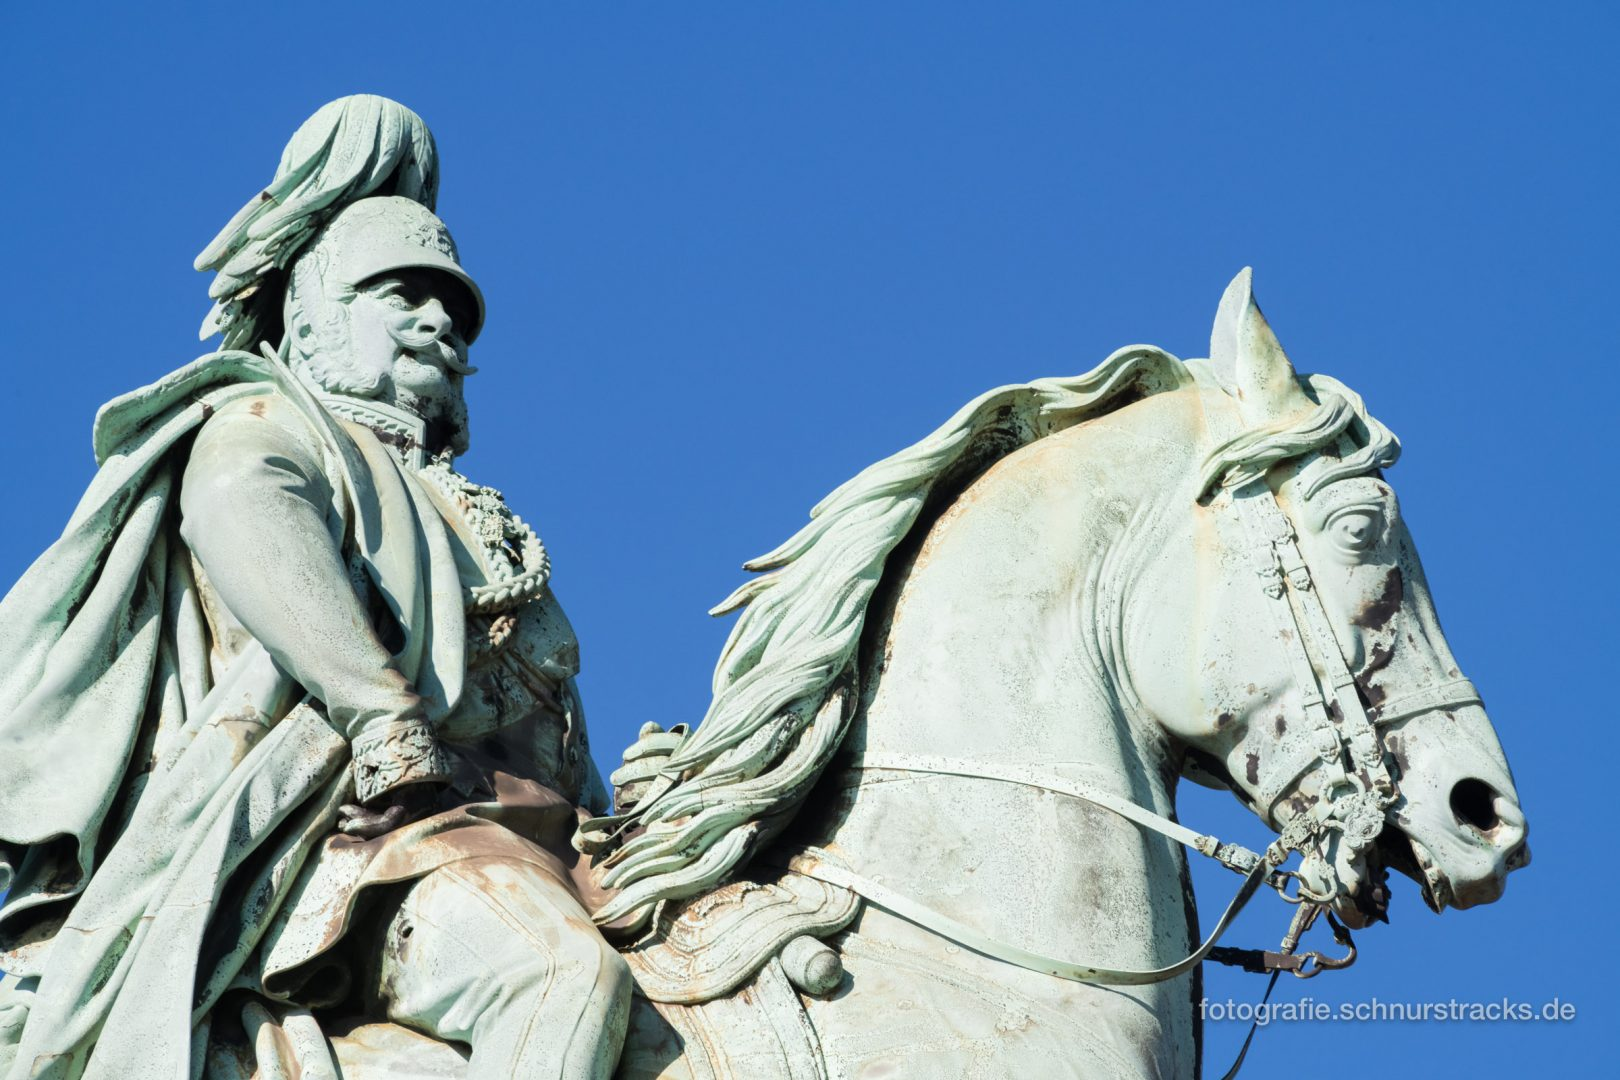 Reiterstandbild Denkmal Kaiser Wilhelm I. #1144